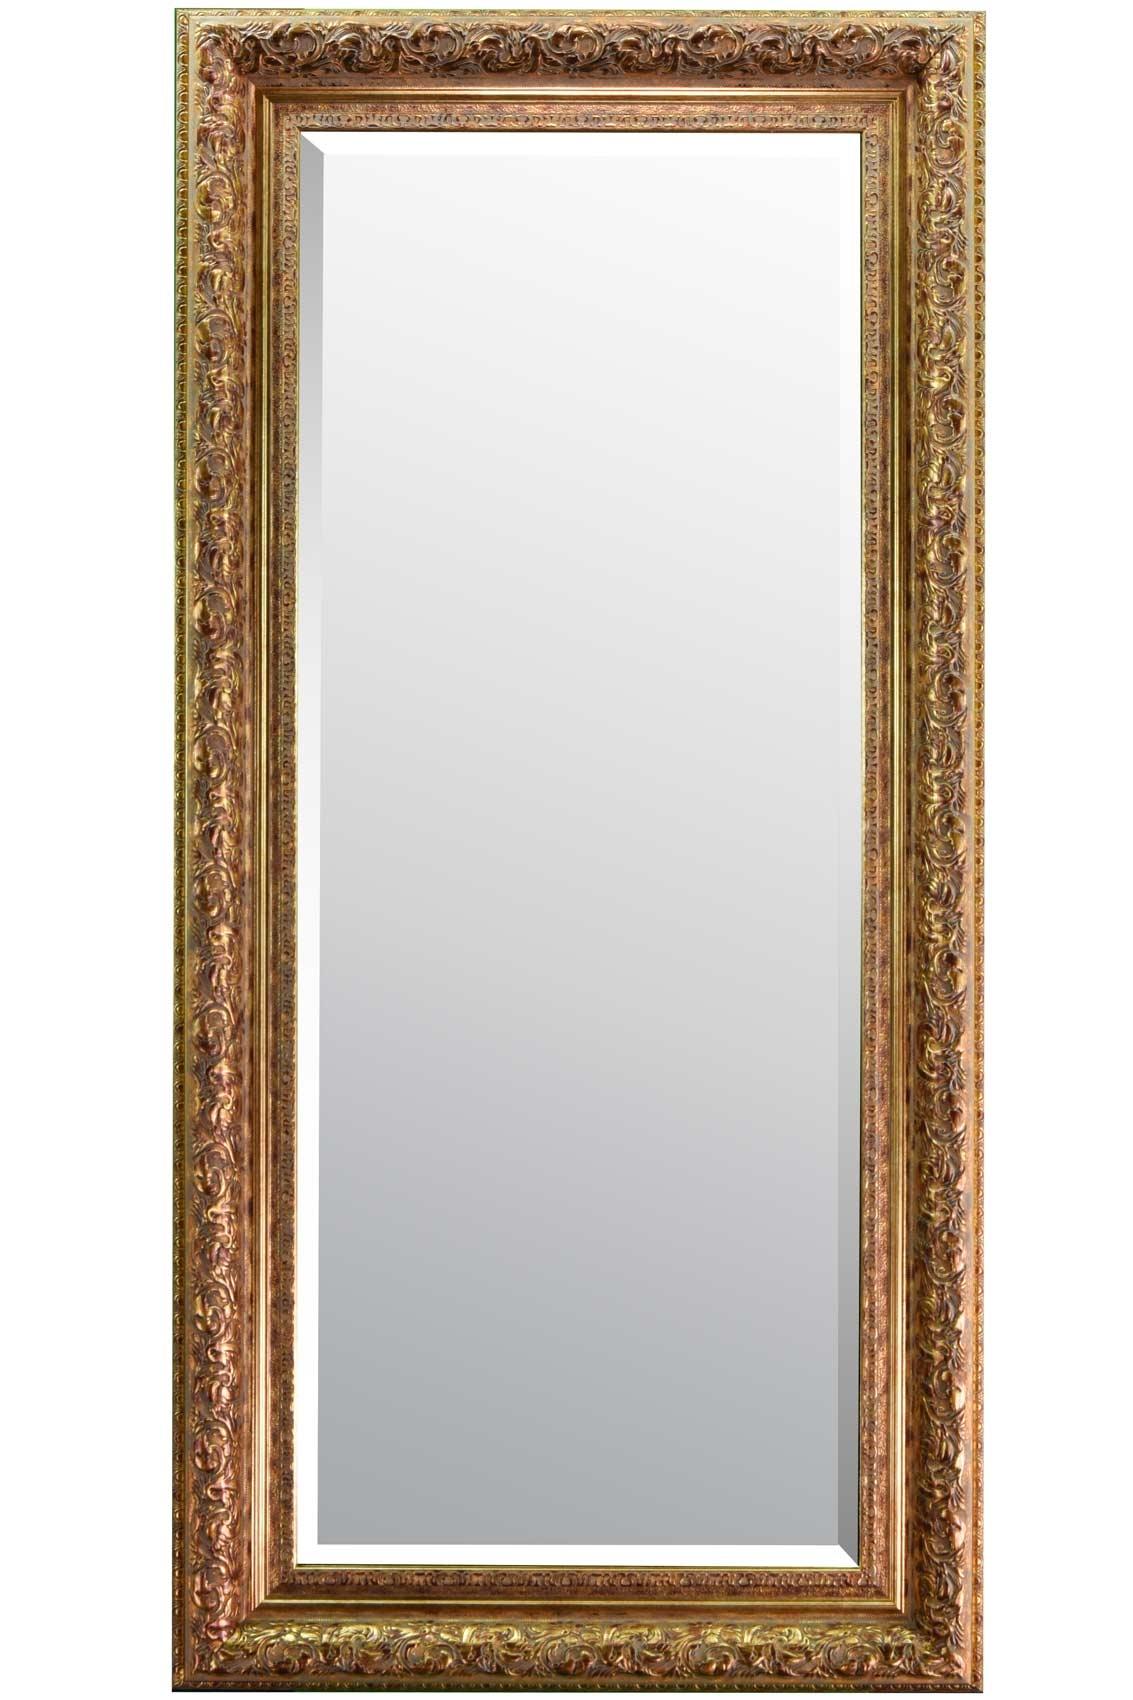 Devonshire Gold Full Length Mirror 177x86cm Soraya Interiors Uk In Full Length Gold Mirror (Image 6 of 15)